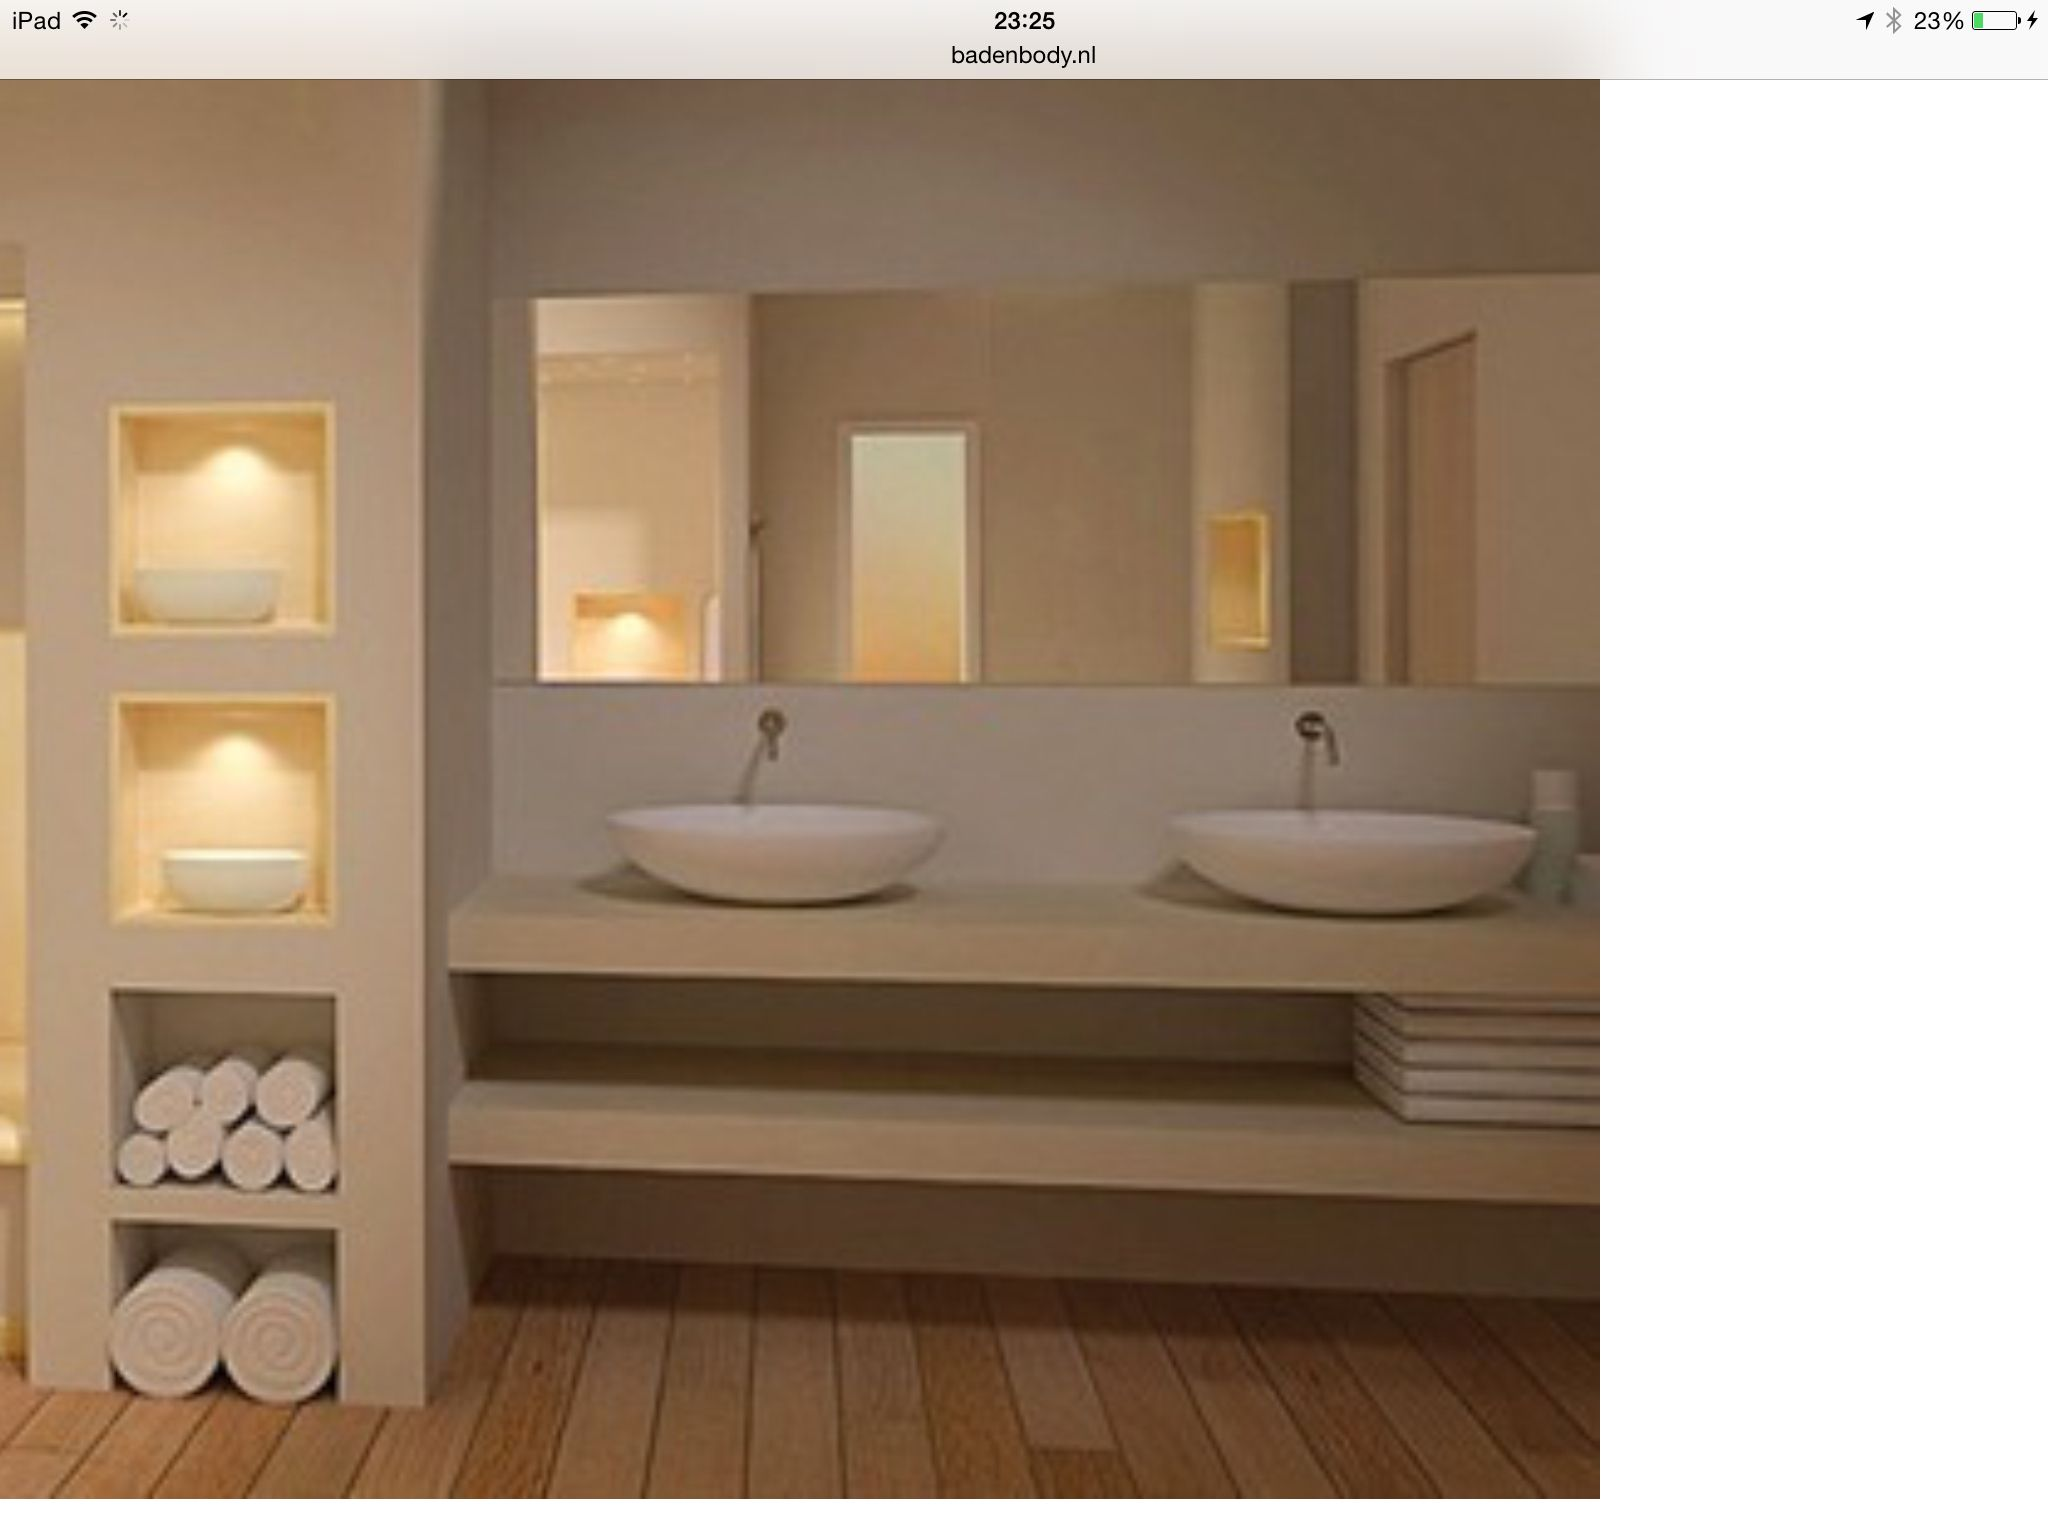 badkamer met nis en spotjes badkamer pinterest